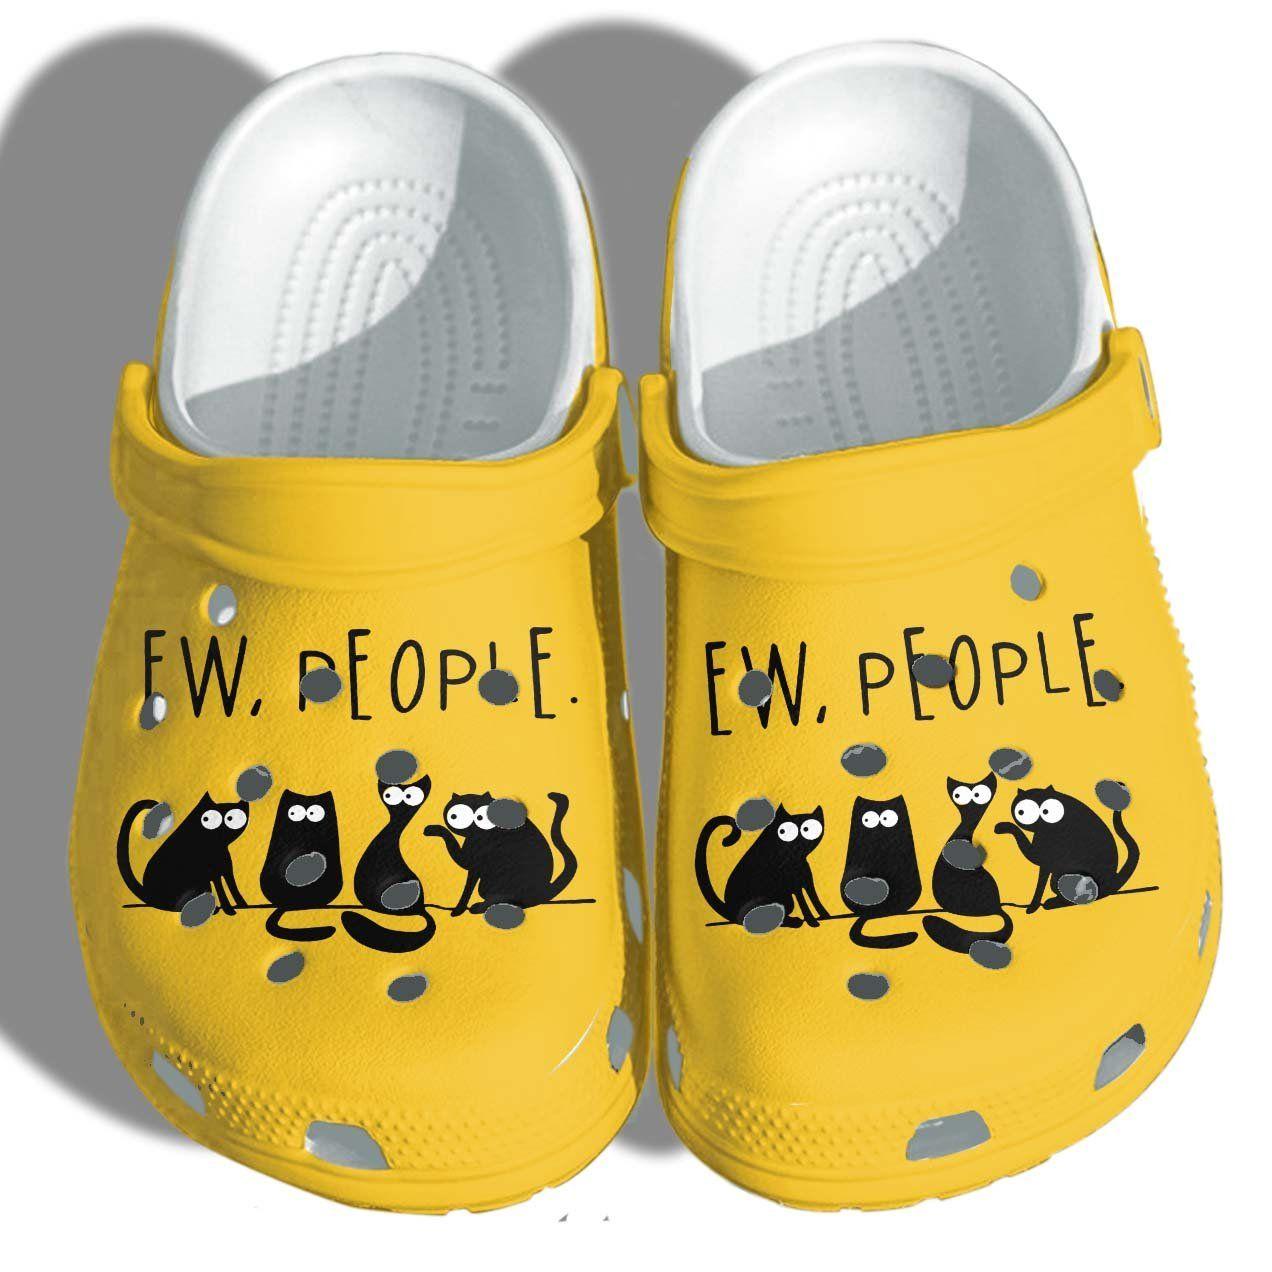 Photo of Ew People Black Cat Shoes Crocs Funny – Anime Cat Meme Croc Shoes Gifts Men Women – Yellow